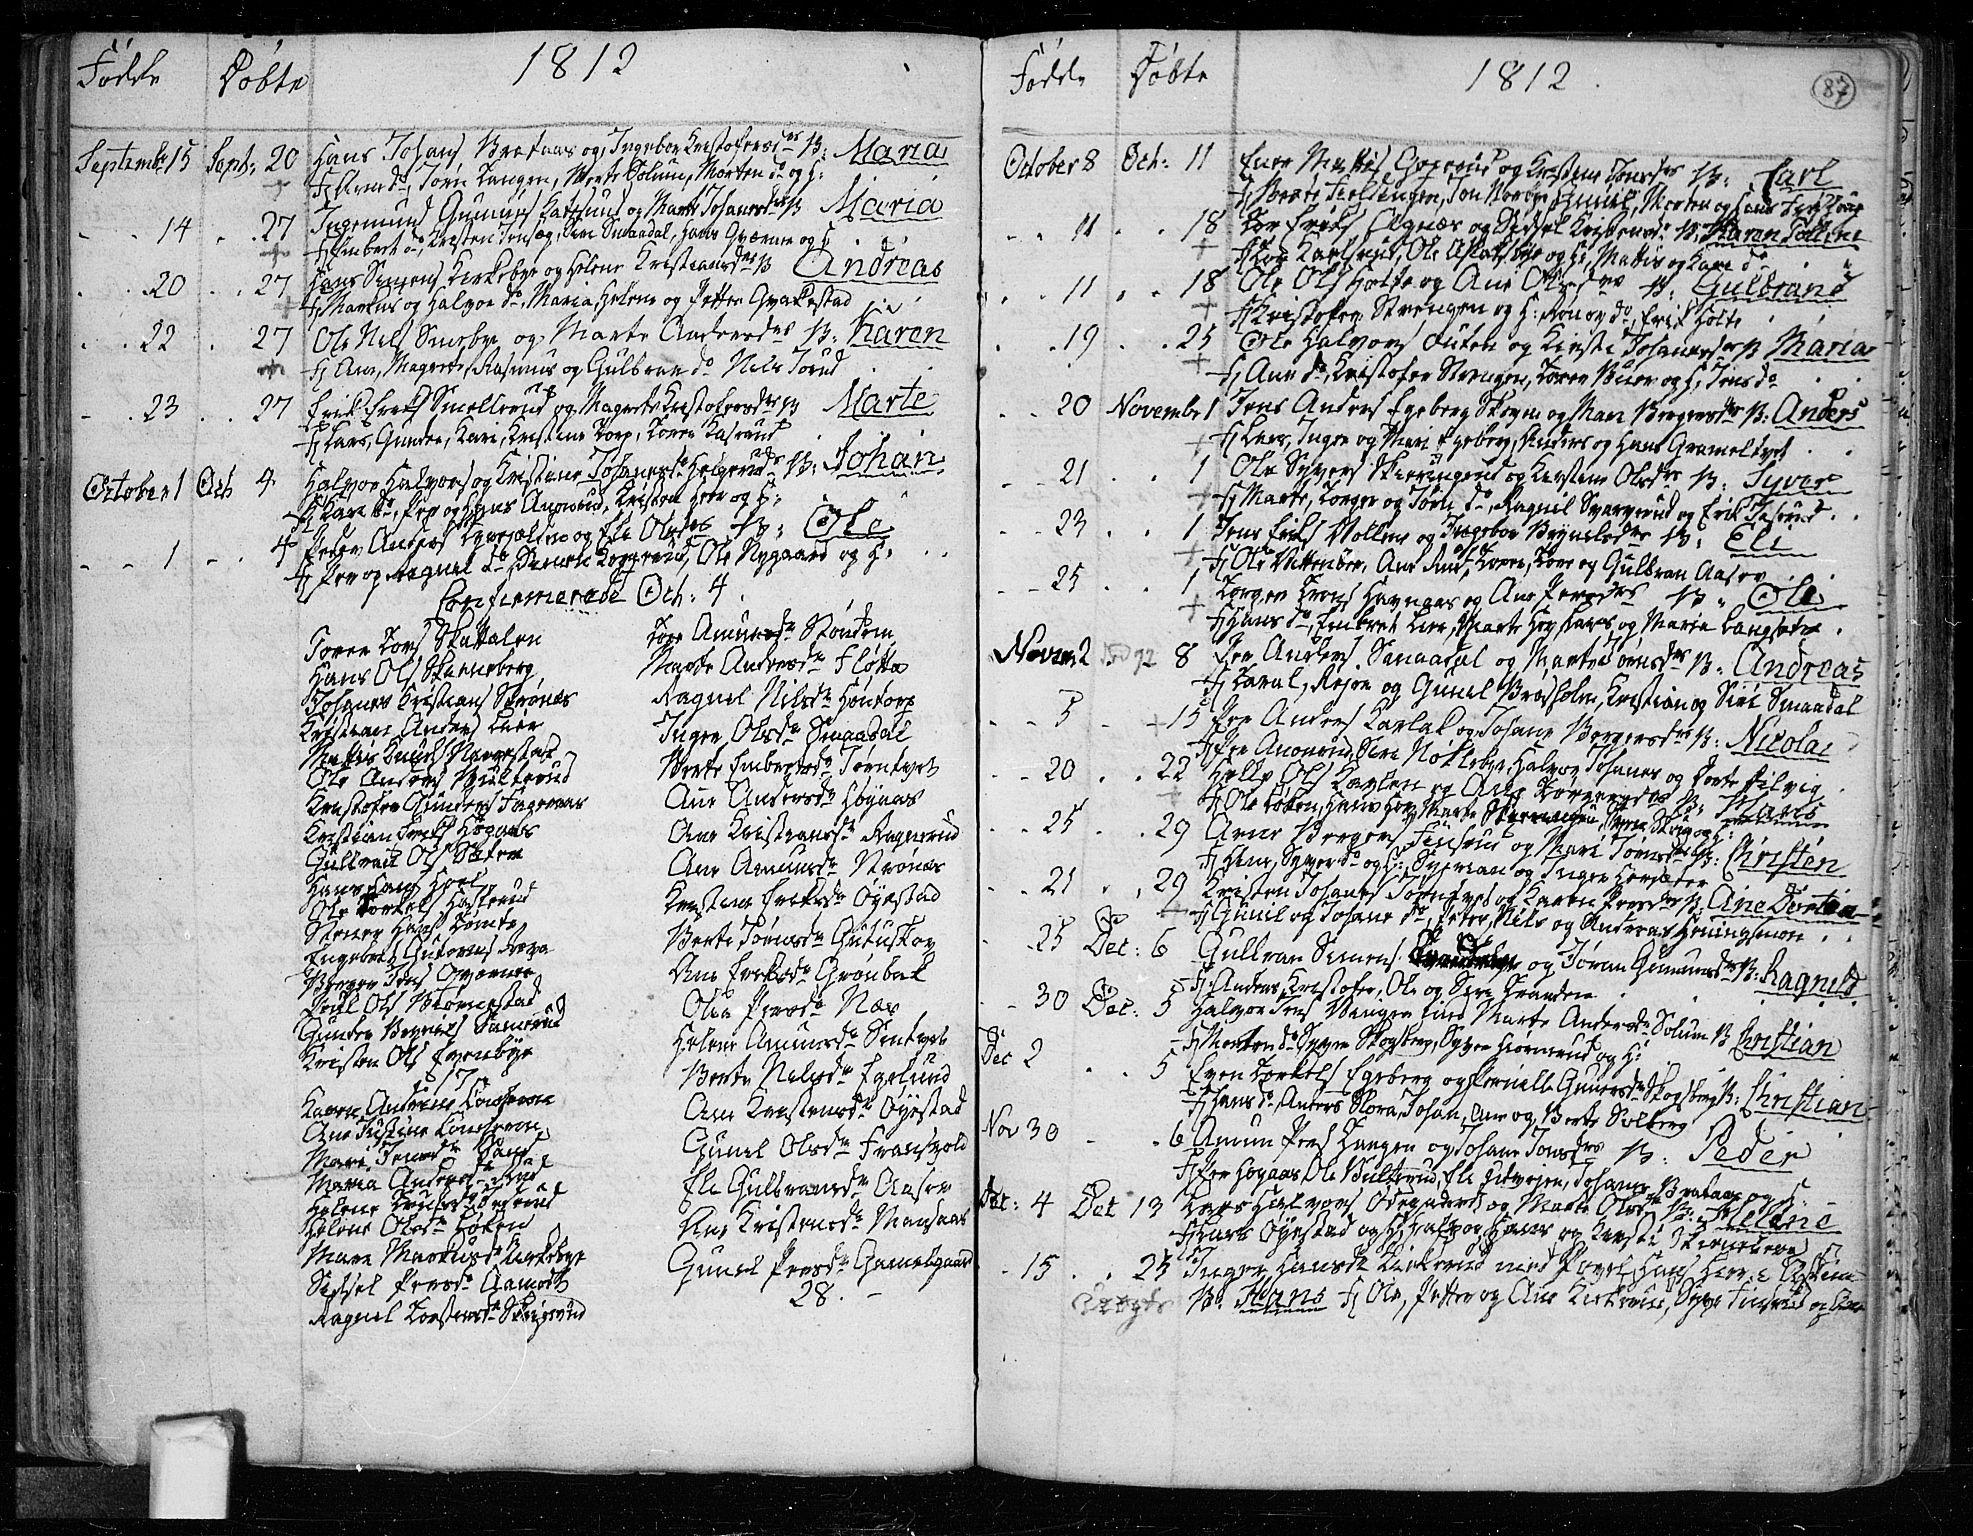 SAO, Trøgstad prestekontor Kirkebøker, F/Fa/L0005: Ministerialbok nr. I 5, 1784-1814, s. 87